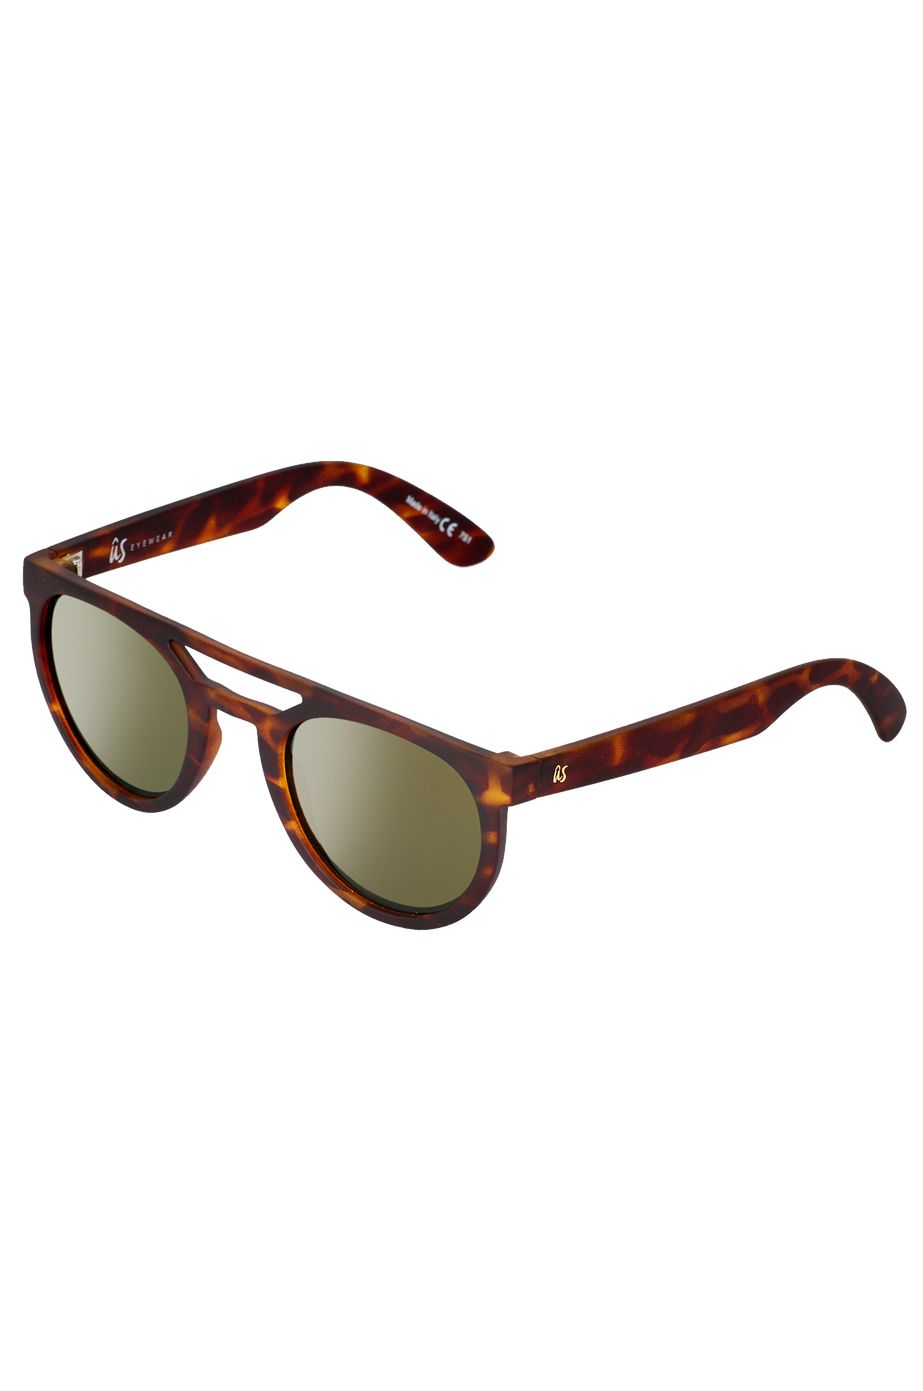 US Sunglasses NEOS Matte Tort/Grey Gold Chrome